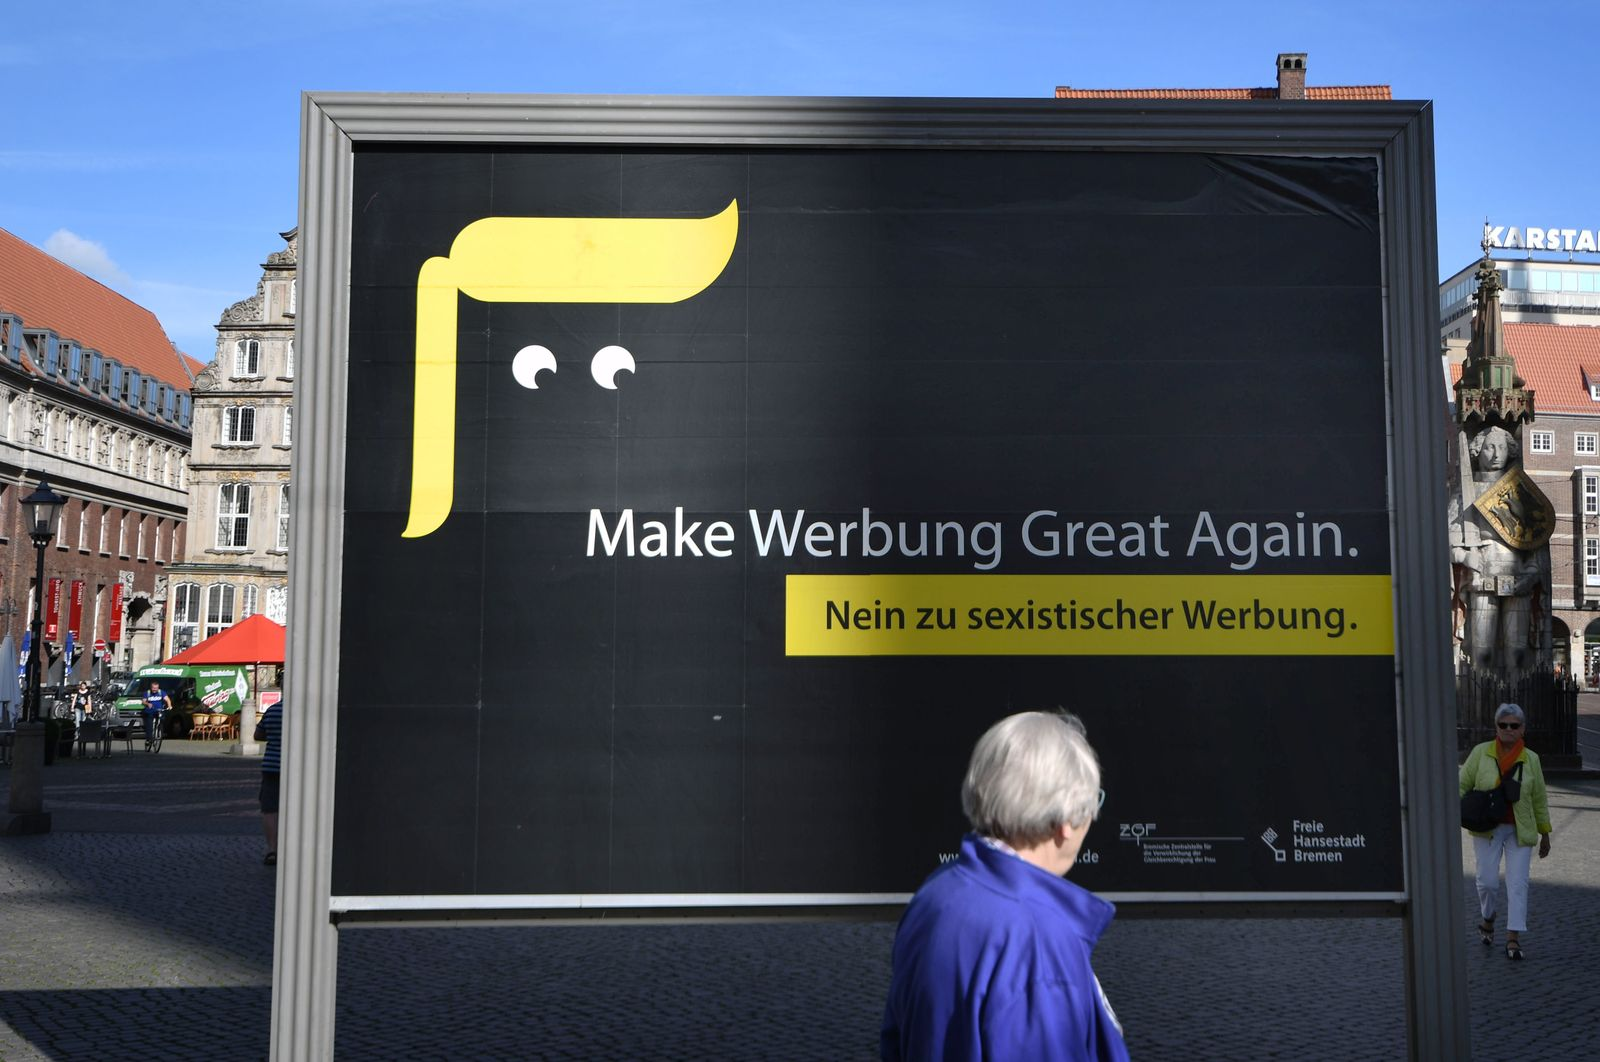 Plakat gegen sexistische Werbung